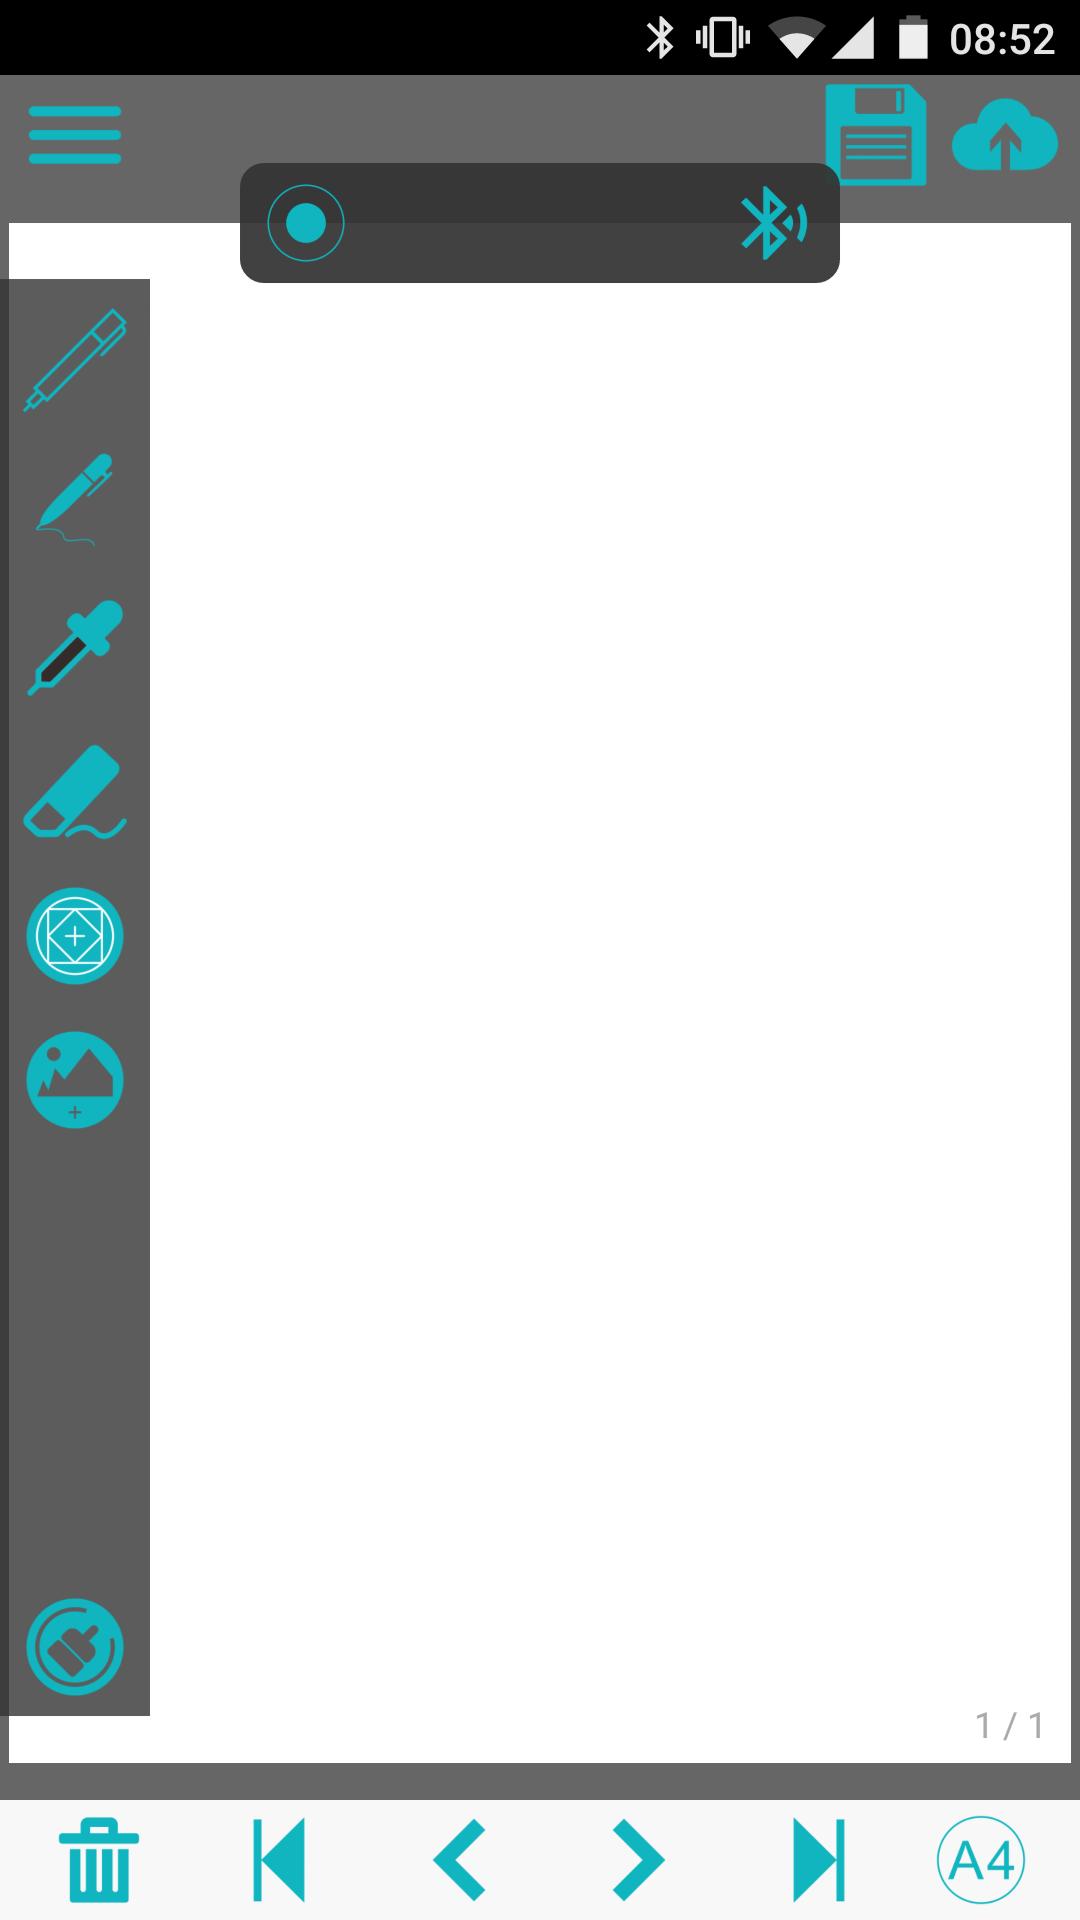 stylo irisnotes air3 smartphone